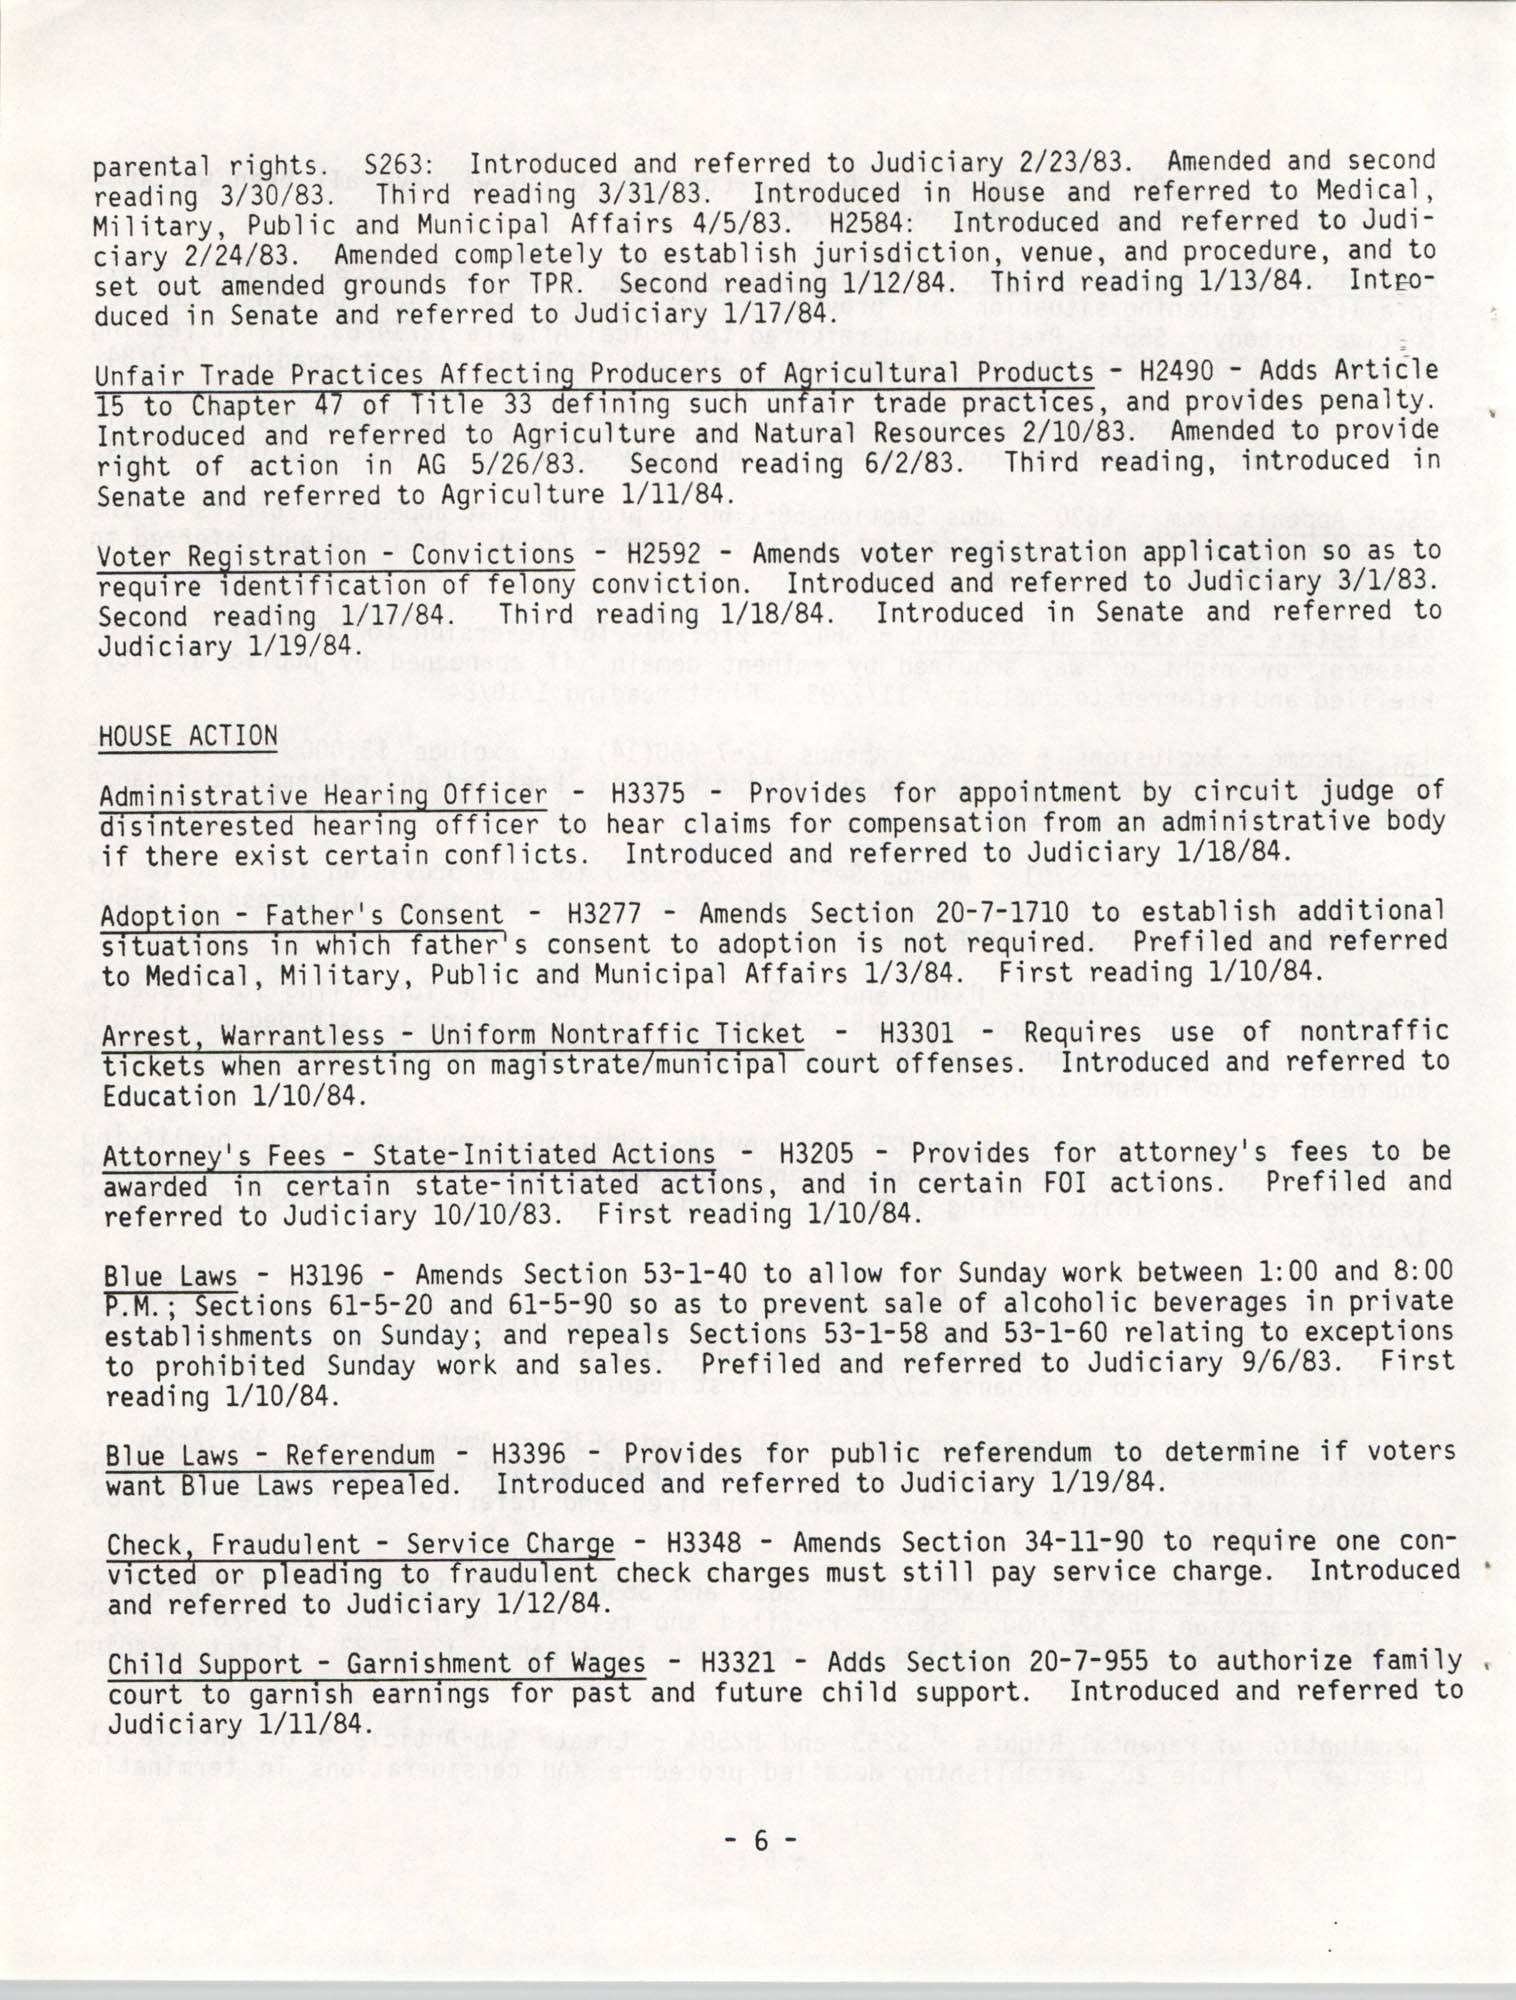 South Carolina Bar Legislative Roundup, Vol. 6 No. 1, January 26, 1984, Page 6